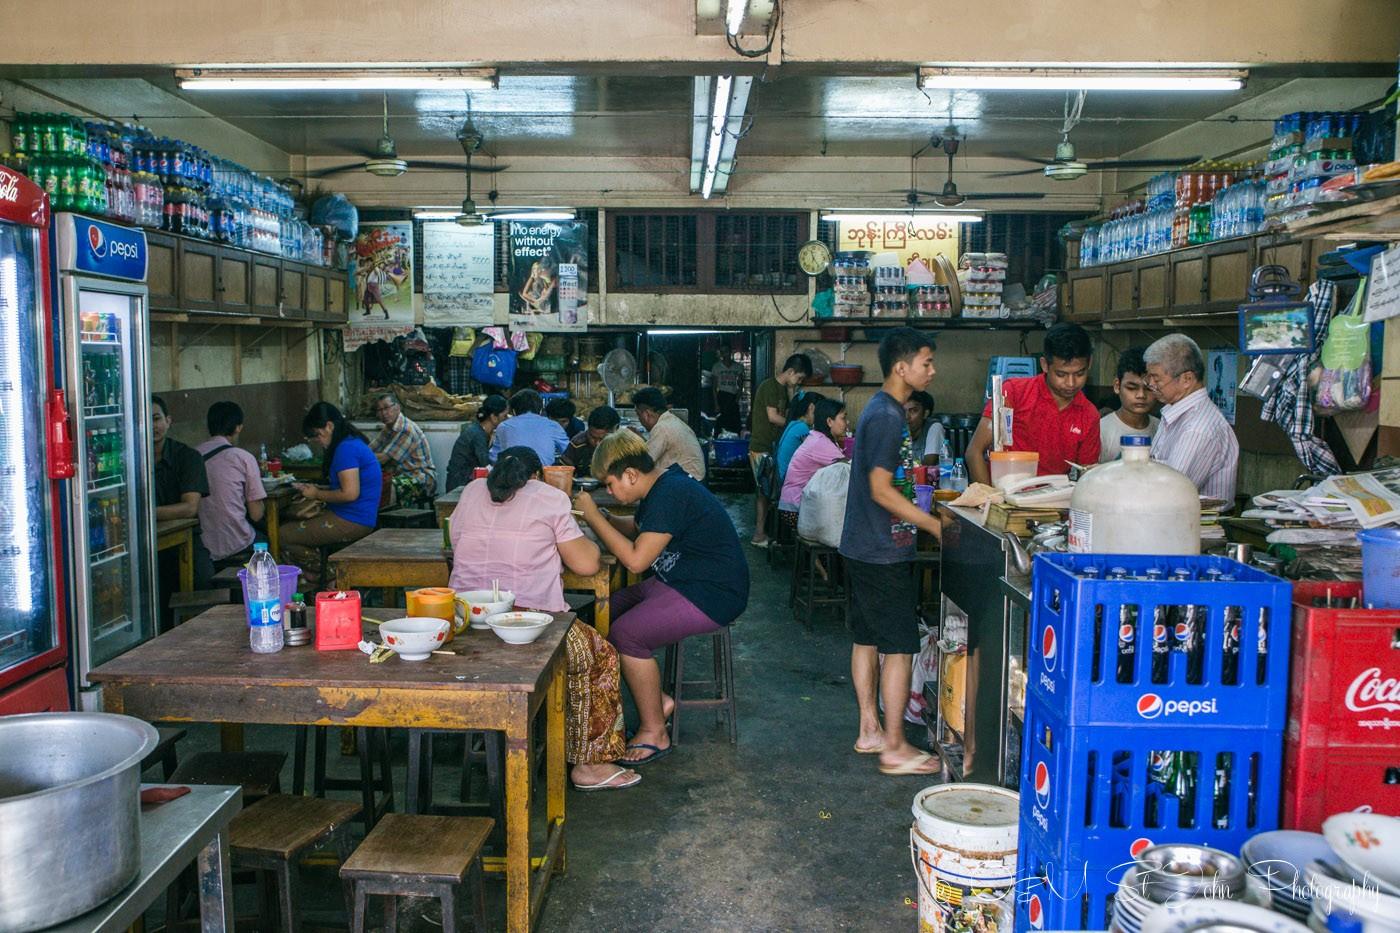 3 days in Yangon: Shop in Yangon